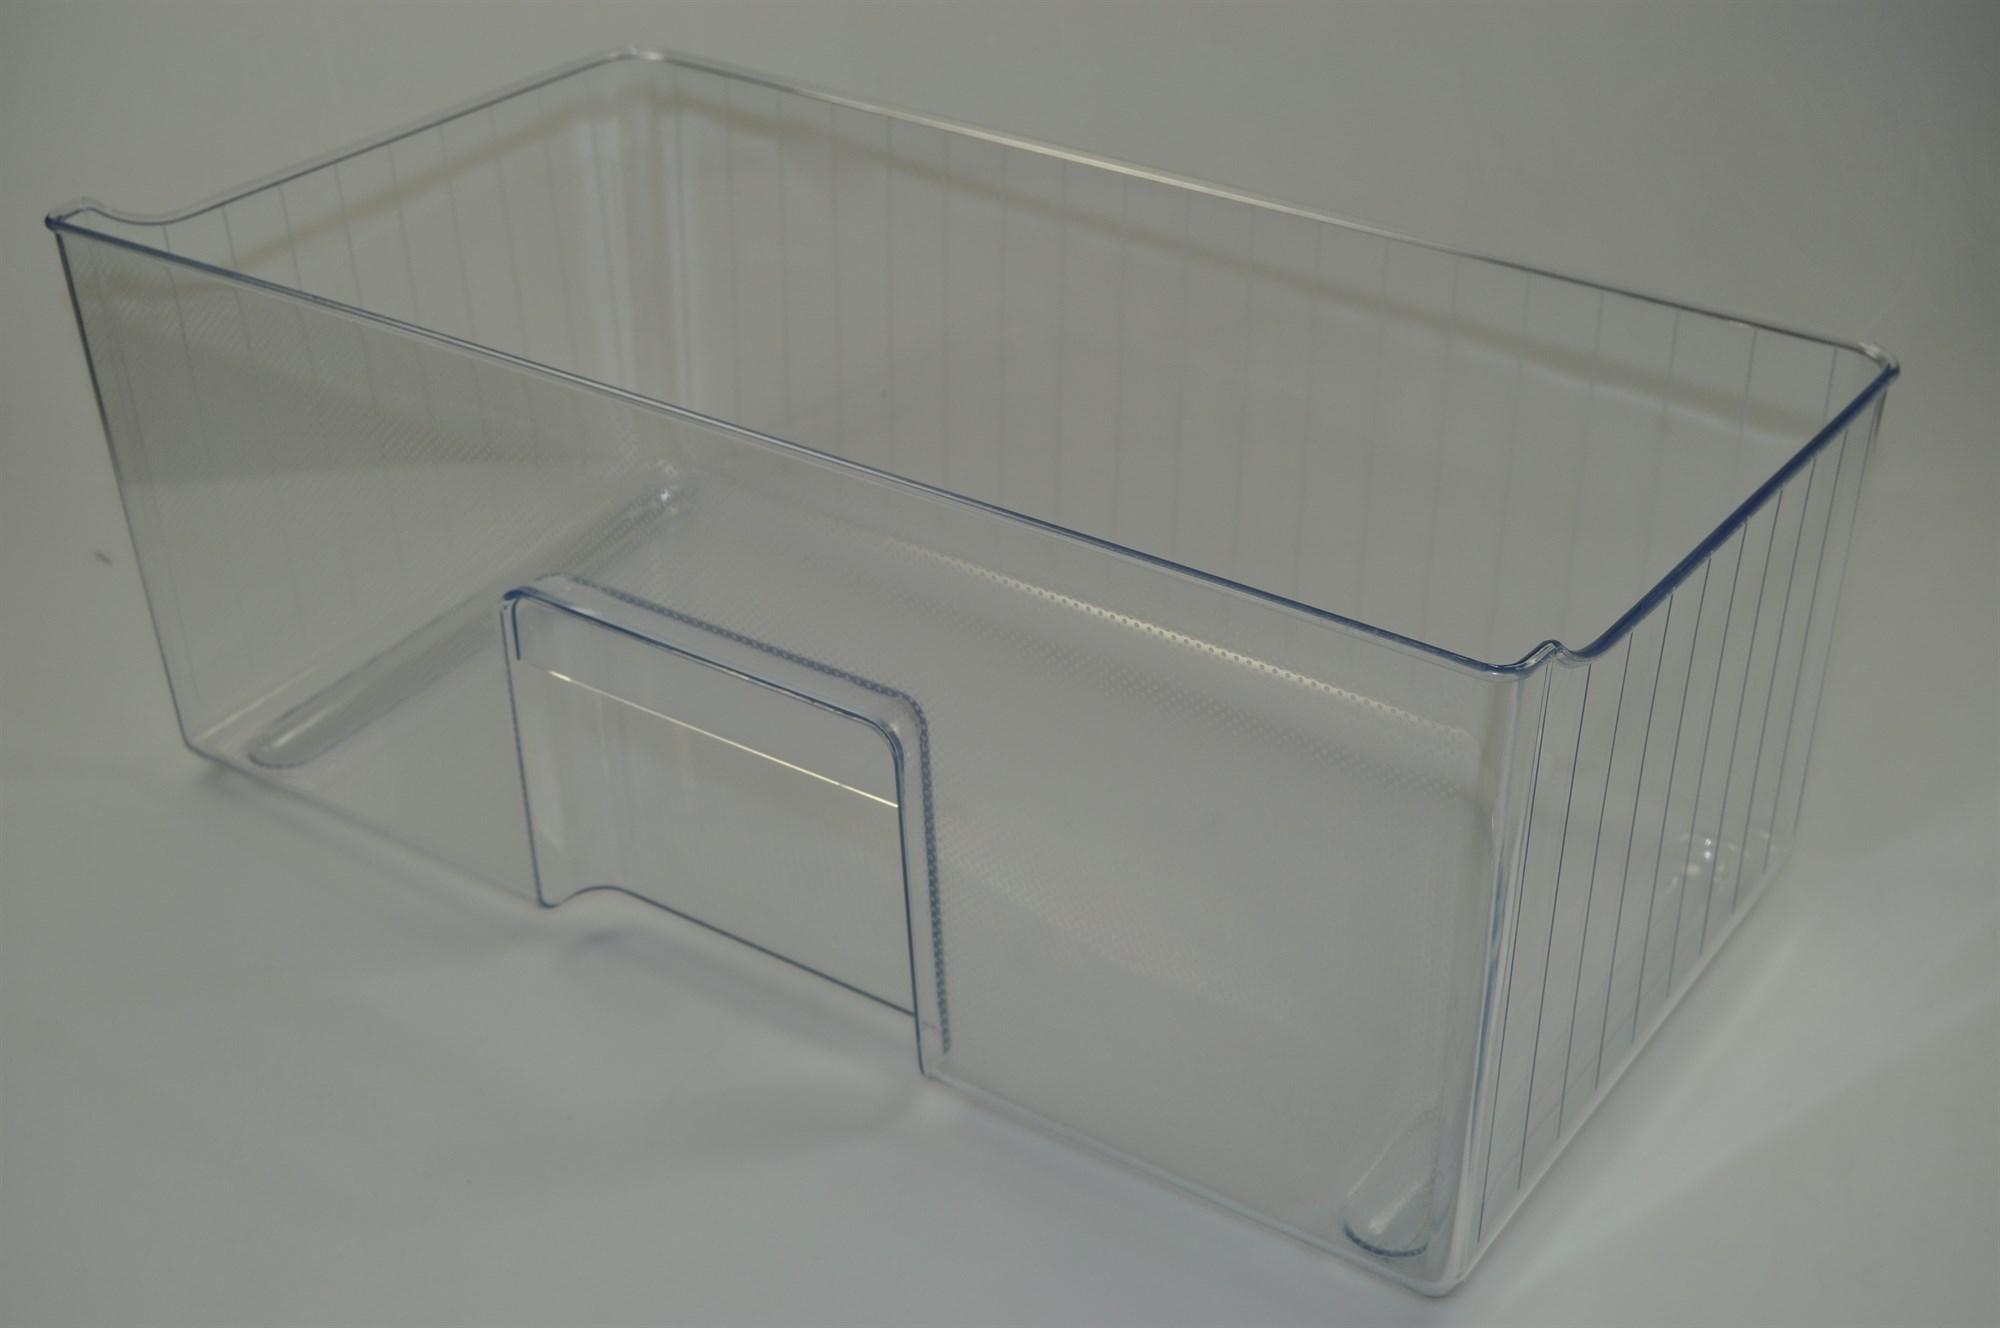 bac l gume bosch frigo cong lateur 200mm x 490mm x 280mm. Black Bedroom Furniture Sets. Home Design Ideas